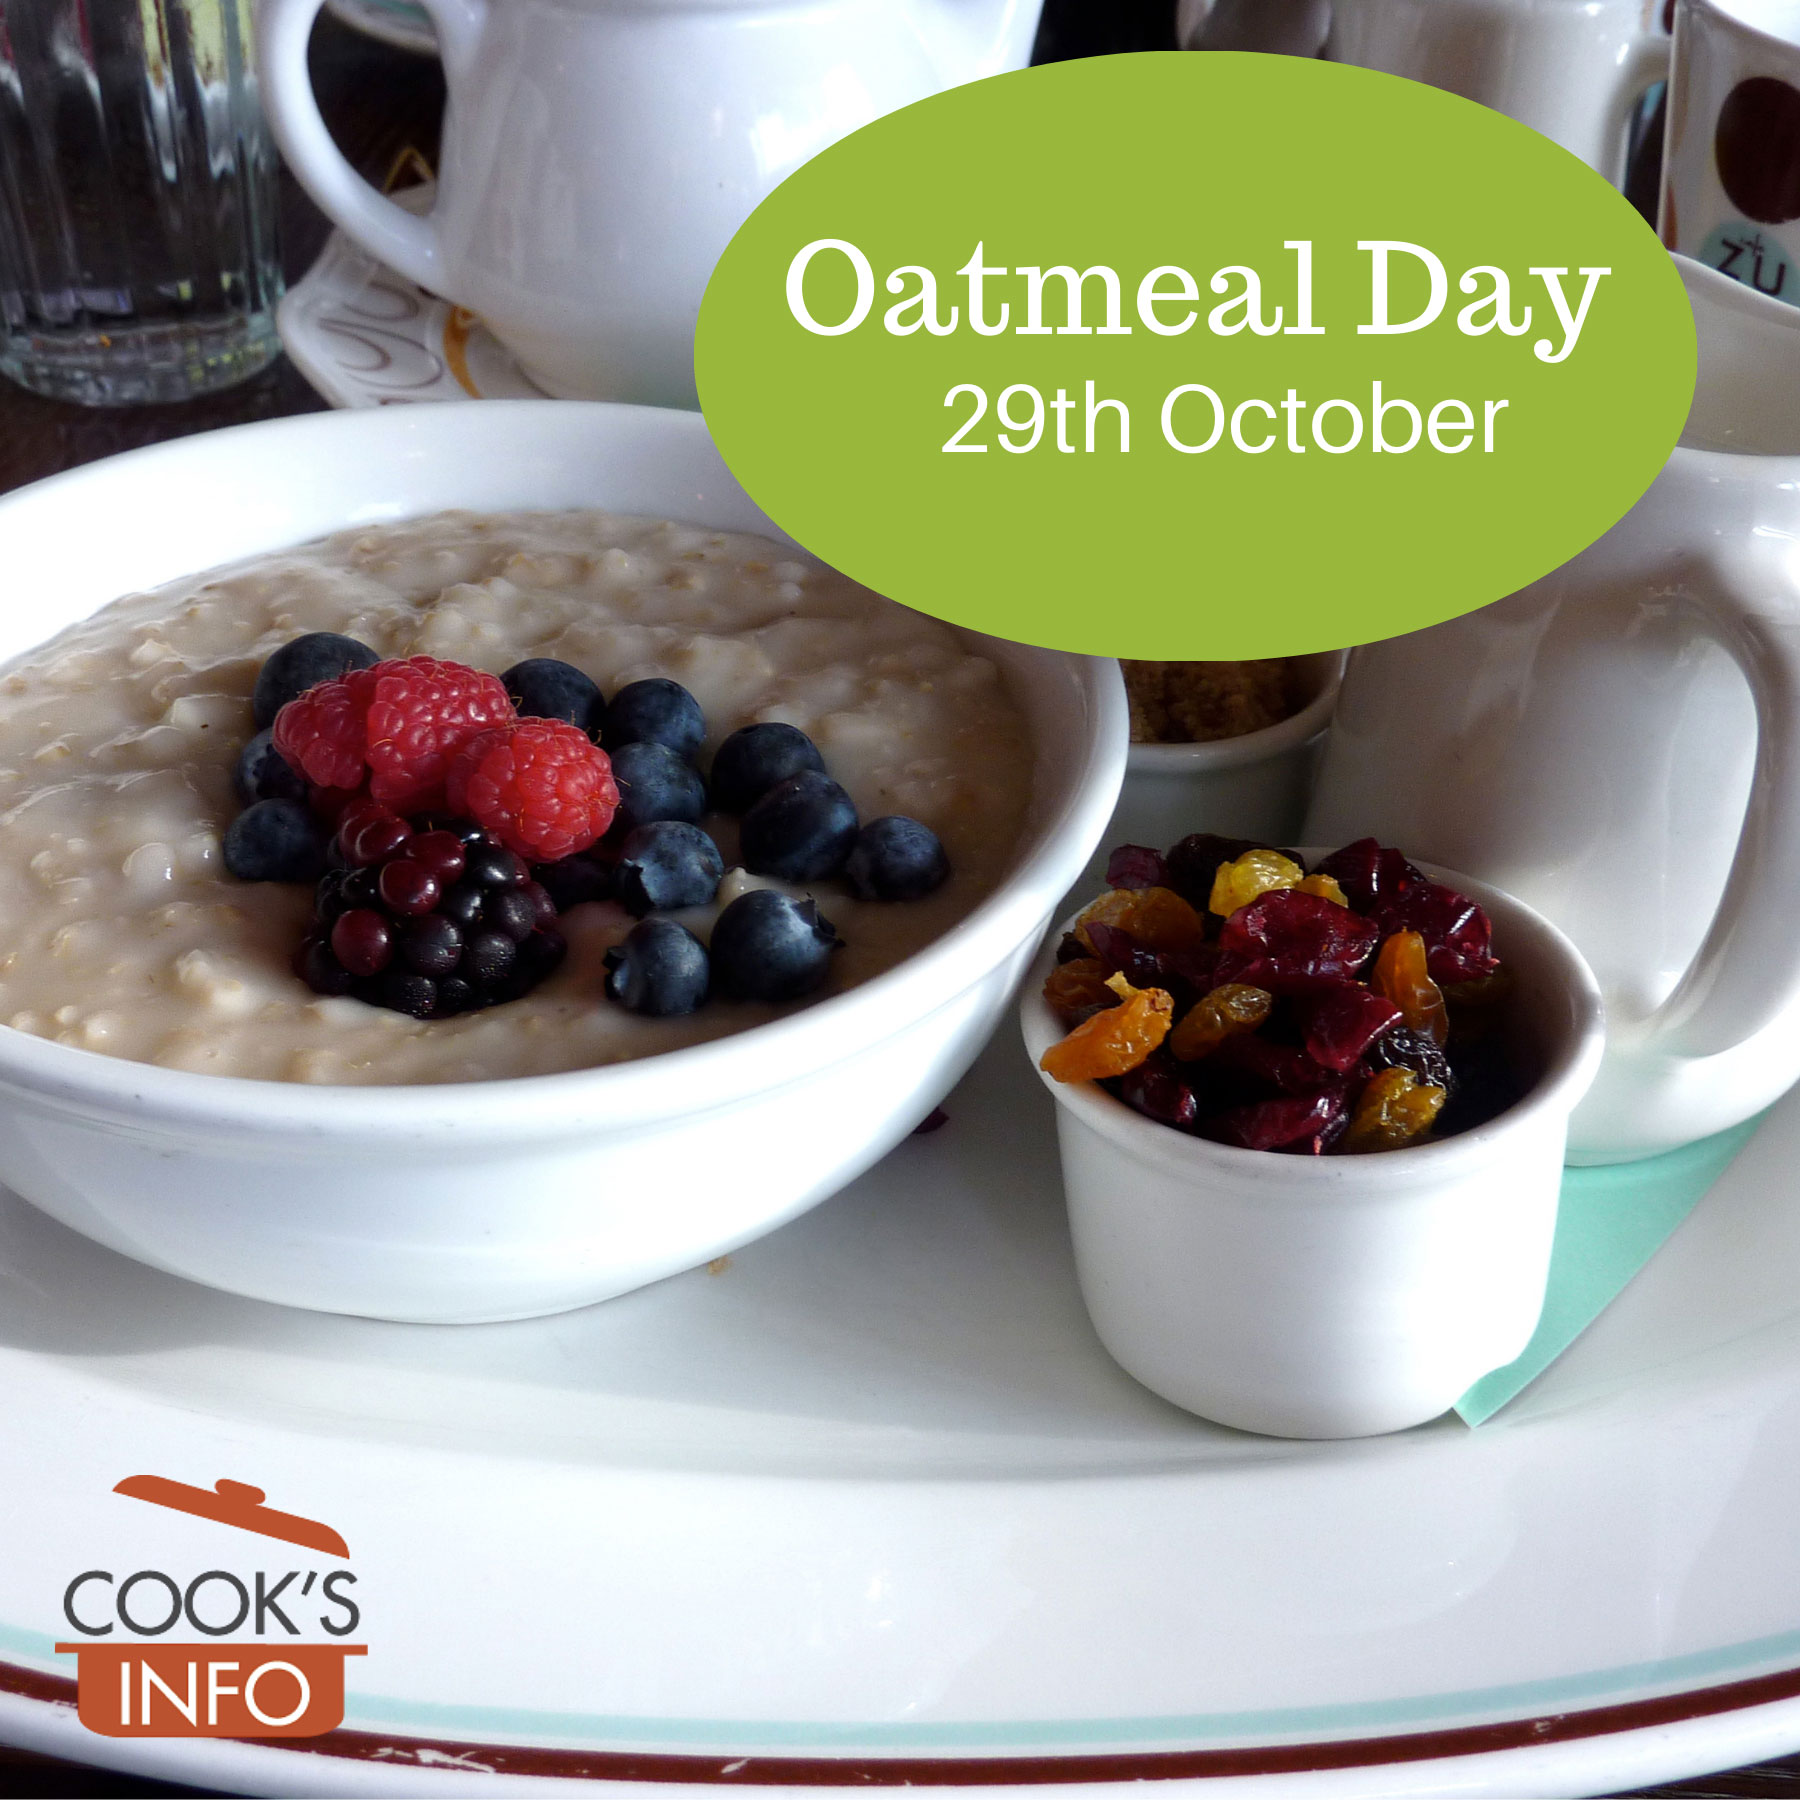 Bowl of oatmeal porridge